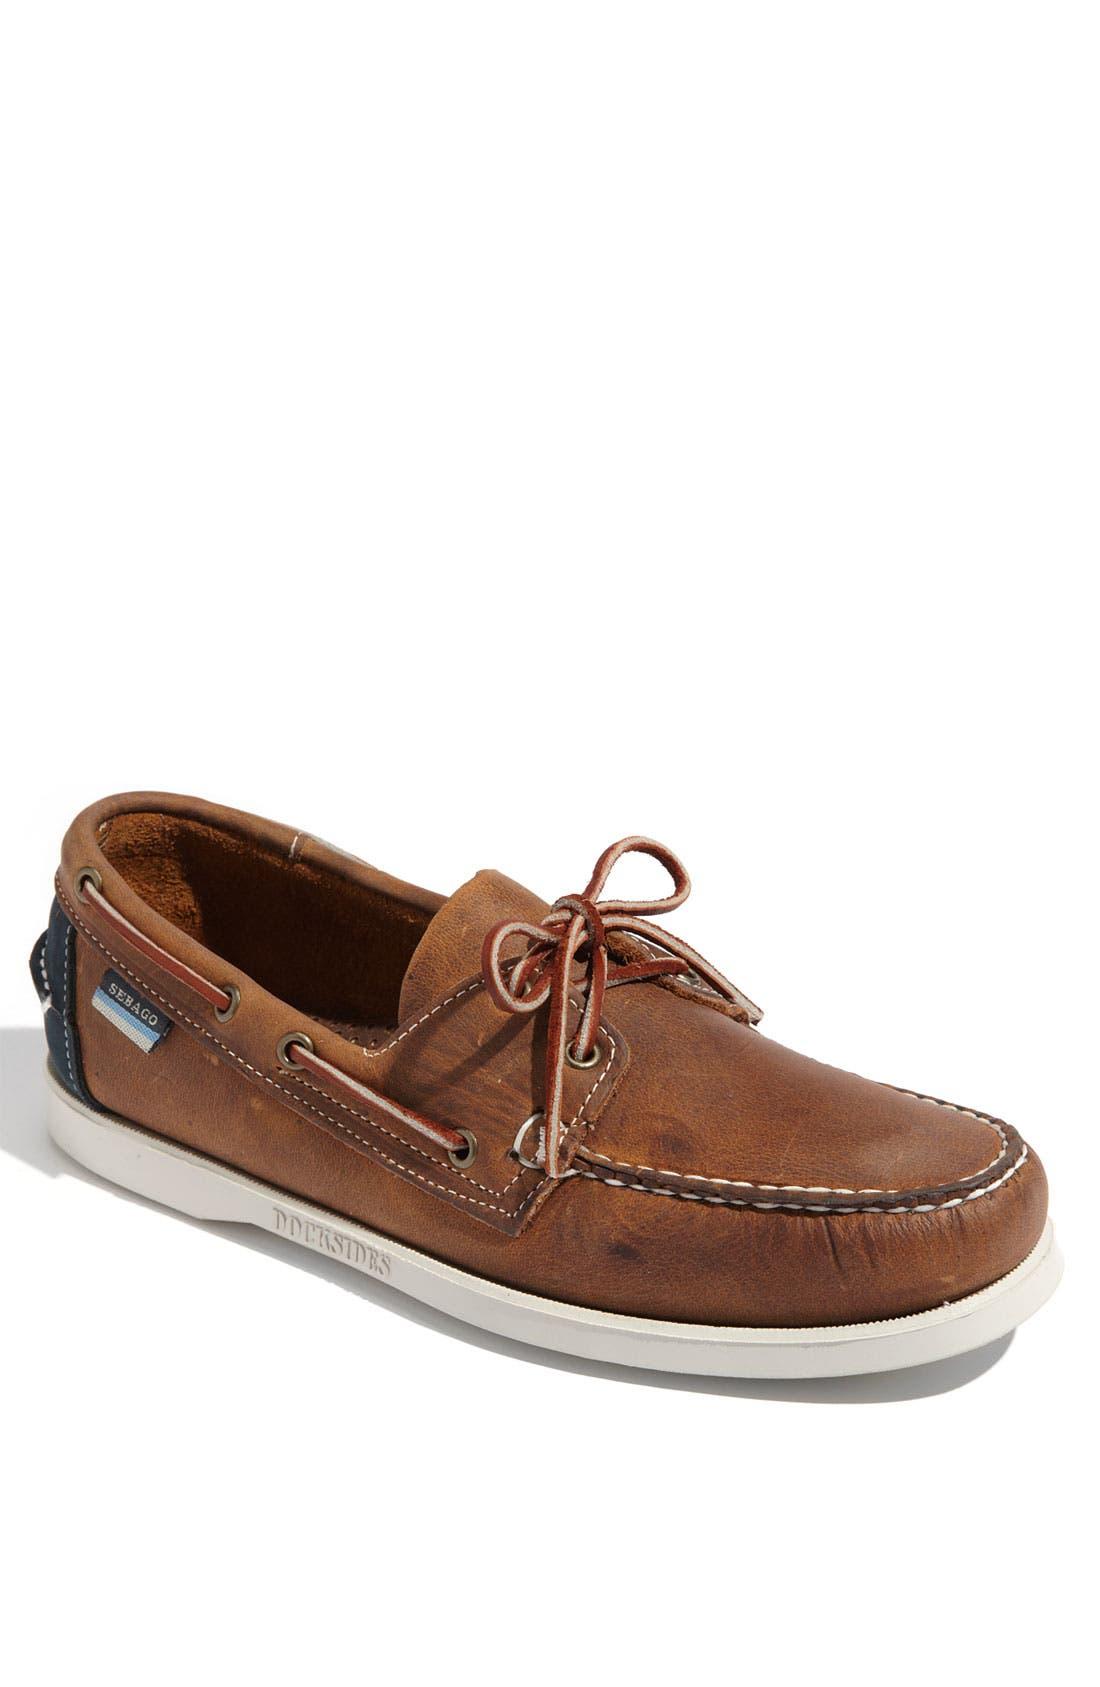 Alternate Image 1 Selected - Sebago 'Spinnaker' Boat Shoe (Men)